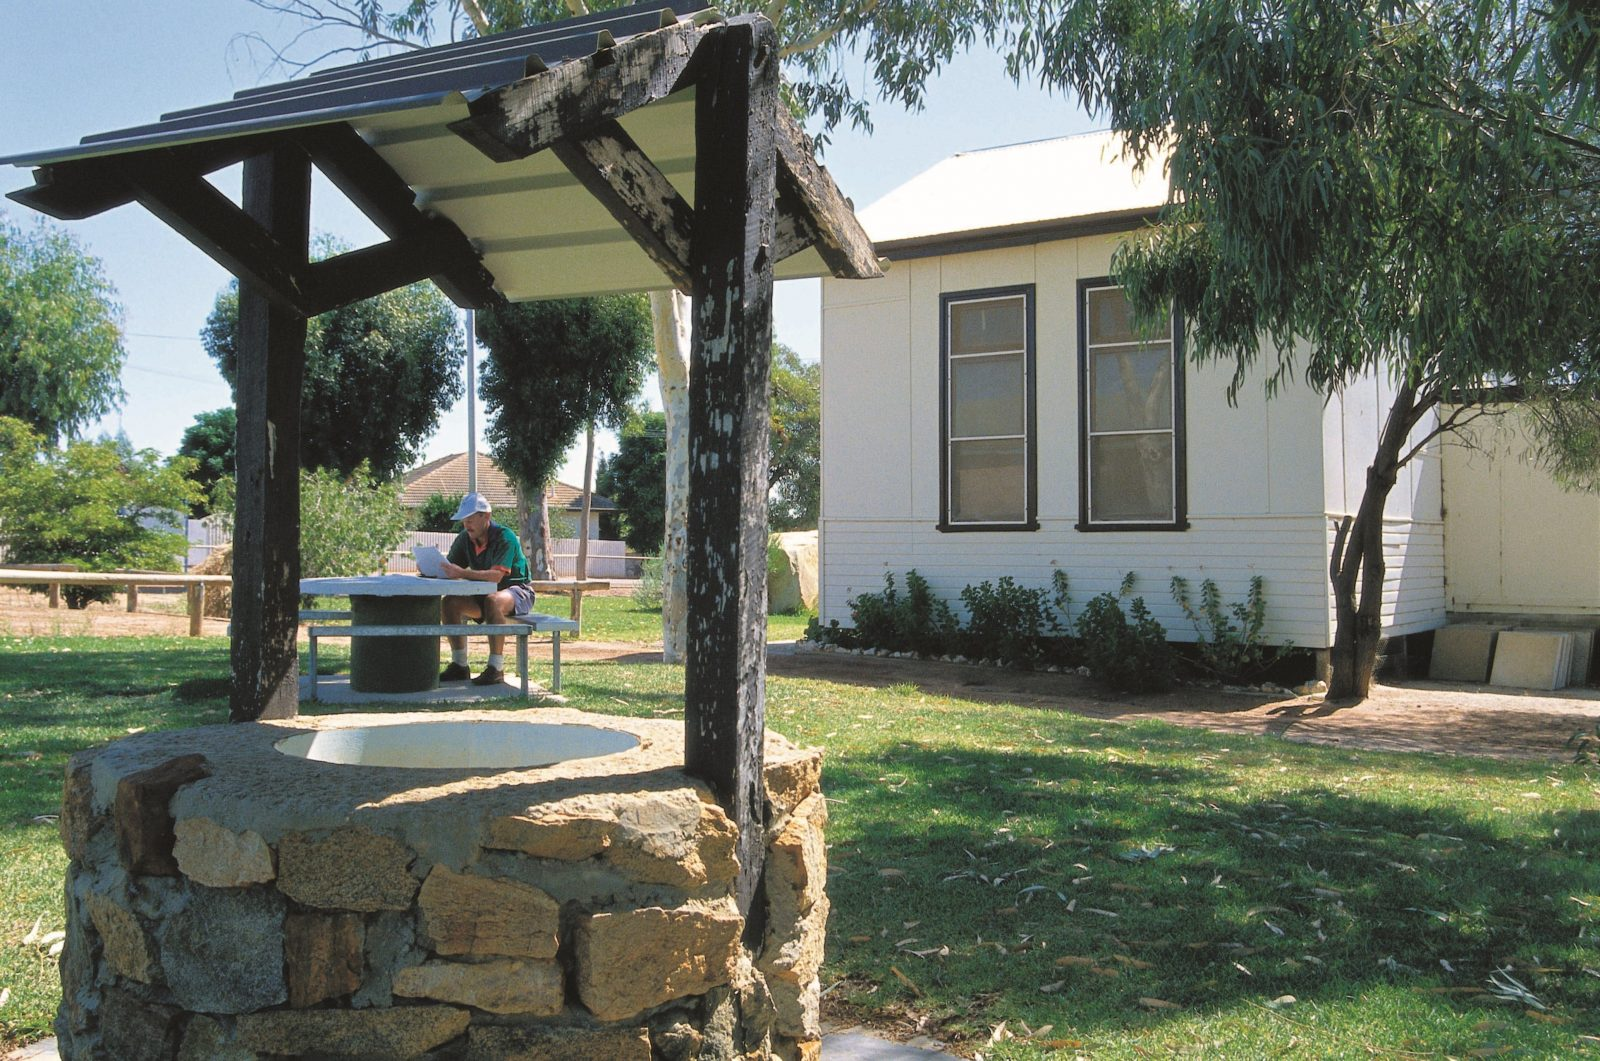 Goomalling Museum, Goomalling, Western Australia